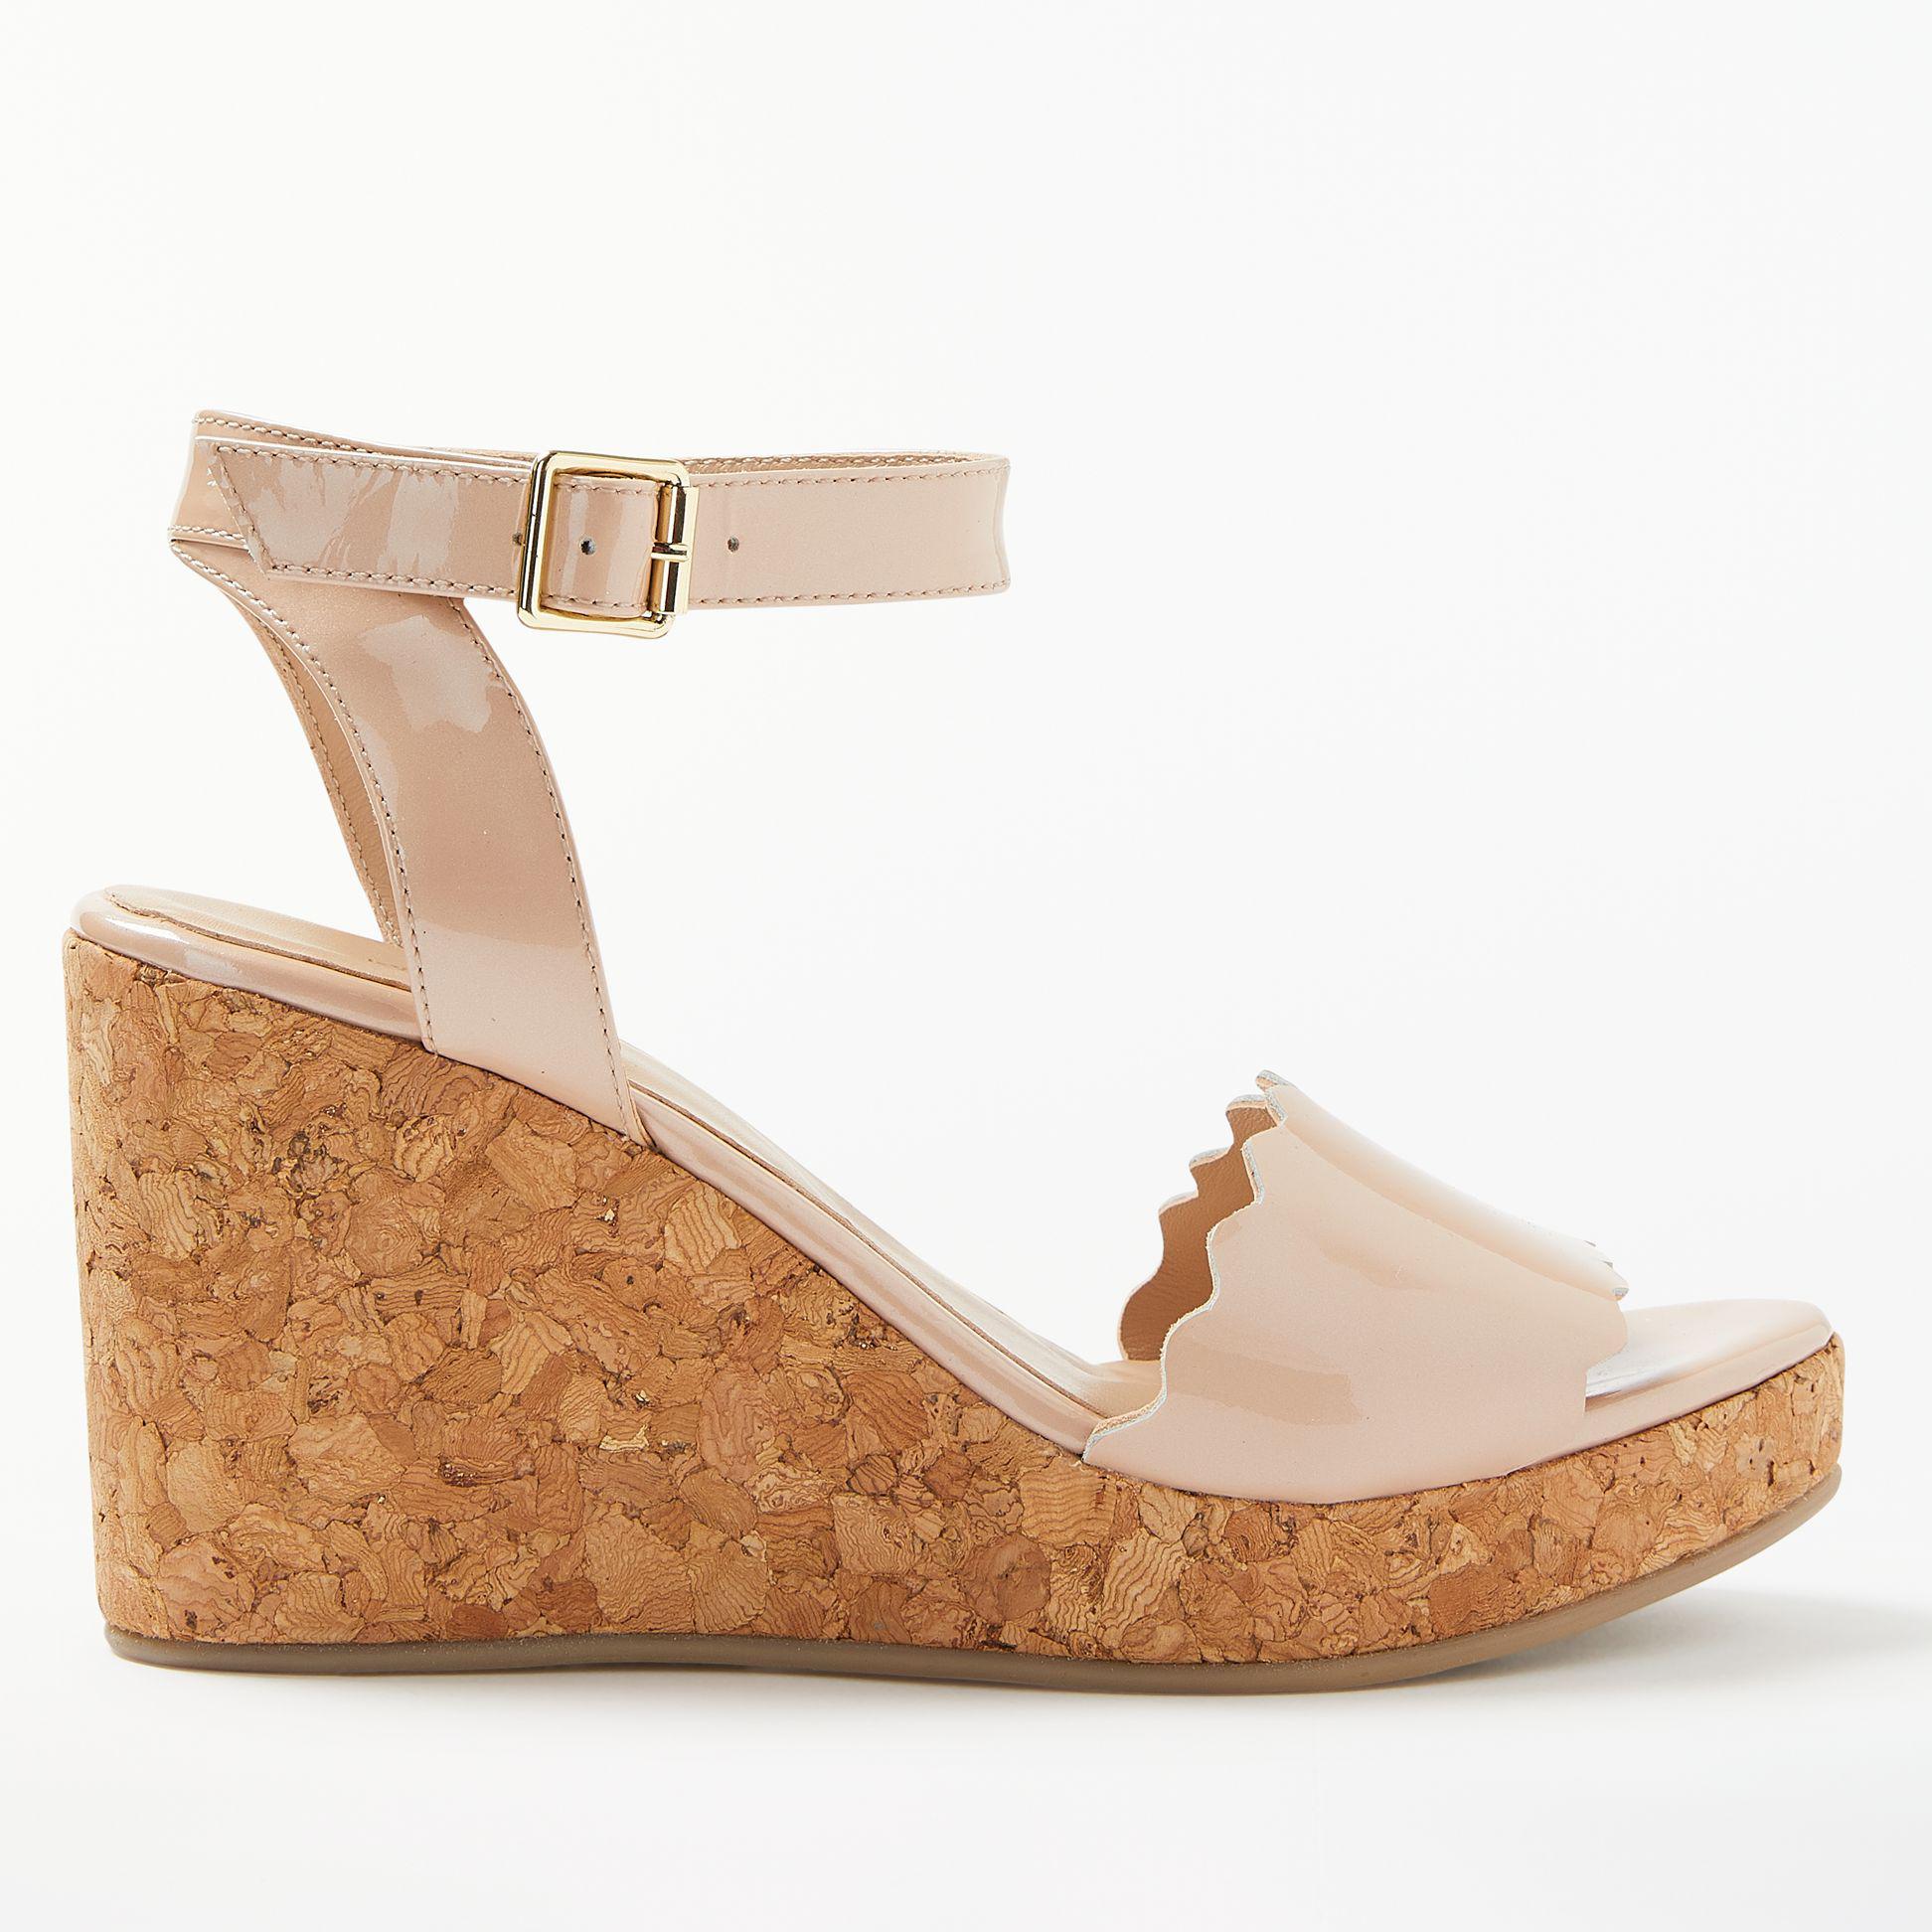 Wedge Heel Natural In Lewis Sandals Lyst Katrina John vIyY7gmb6f